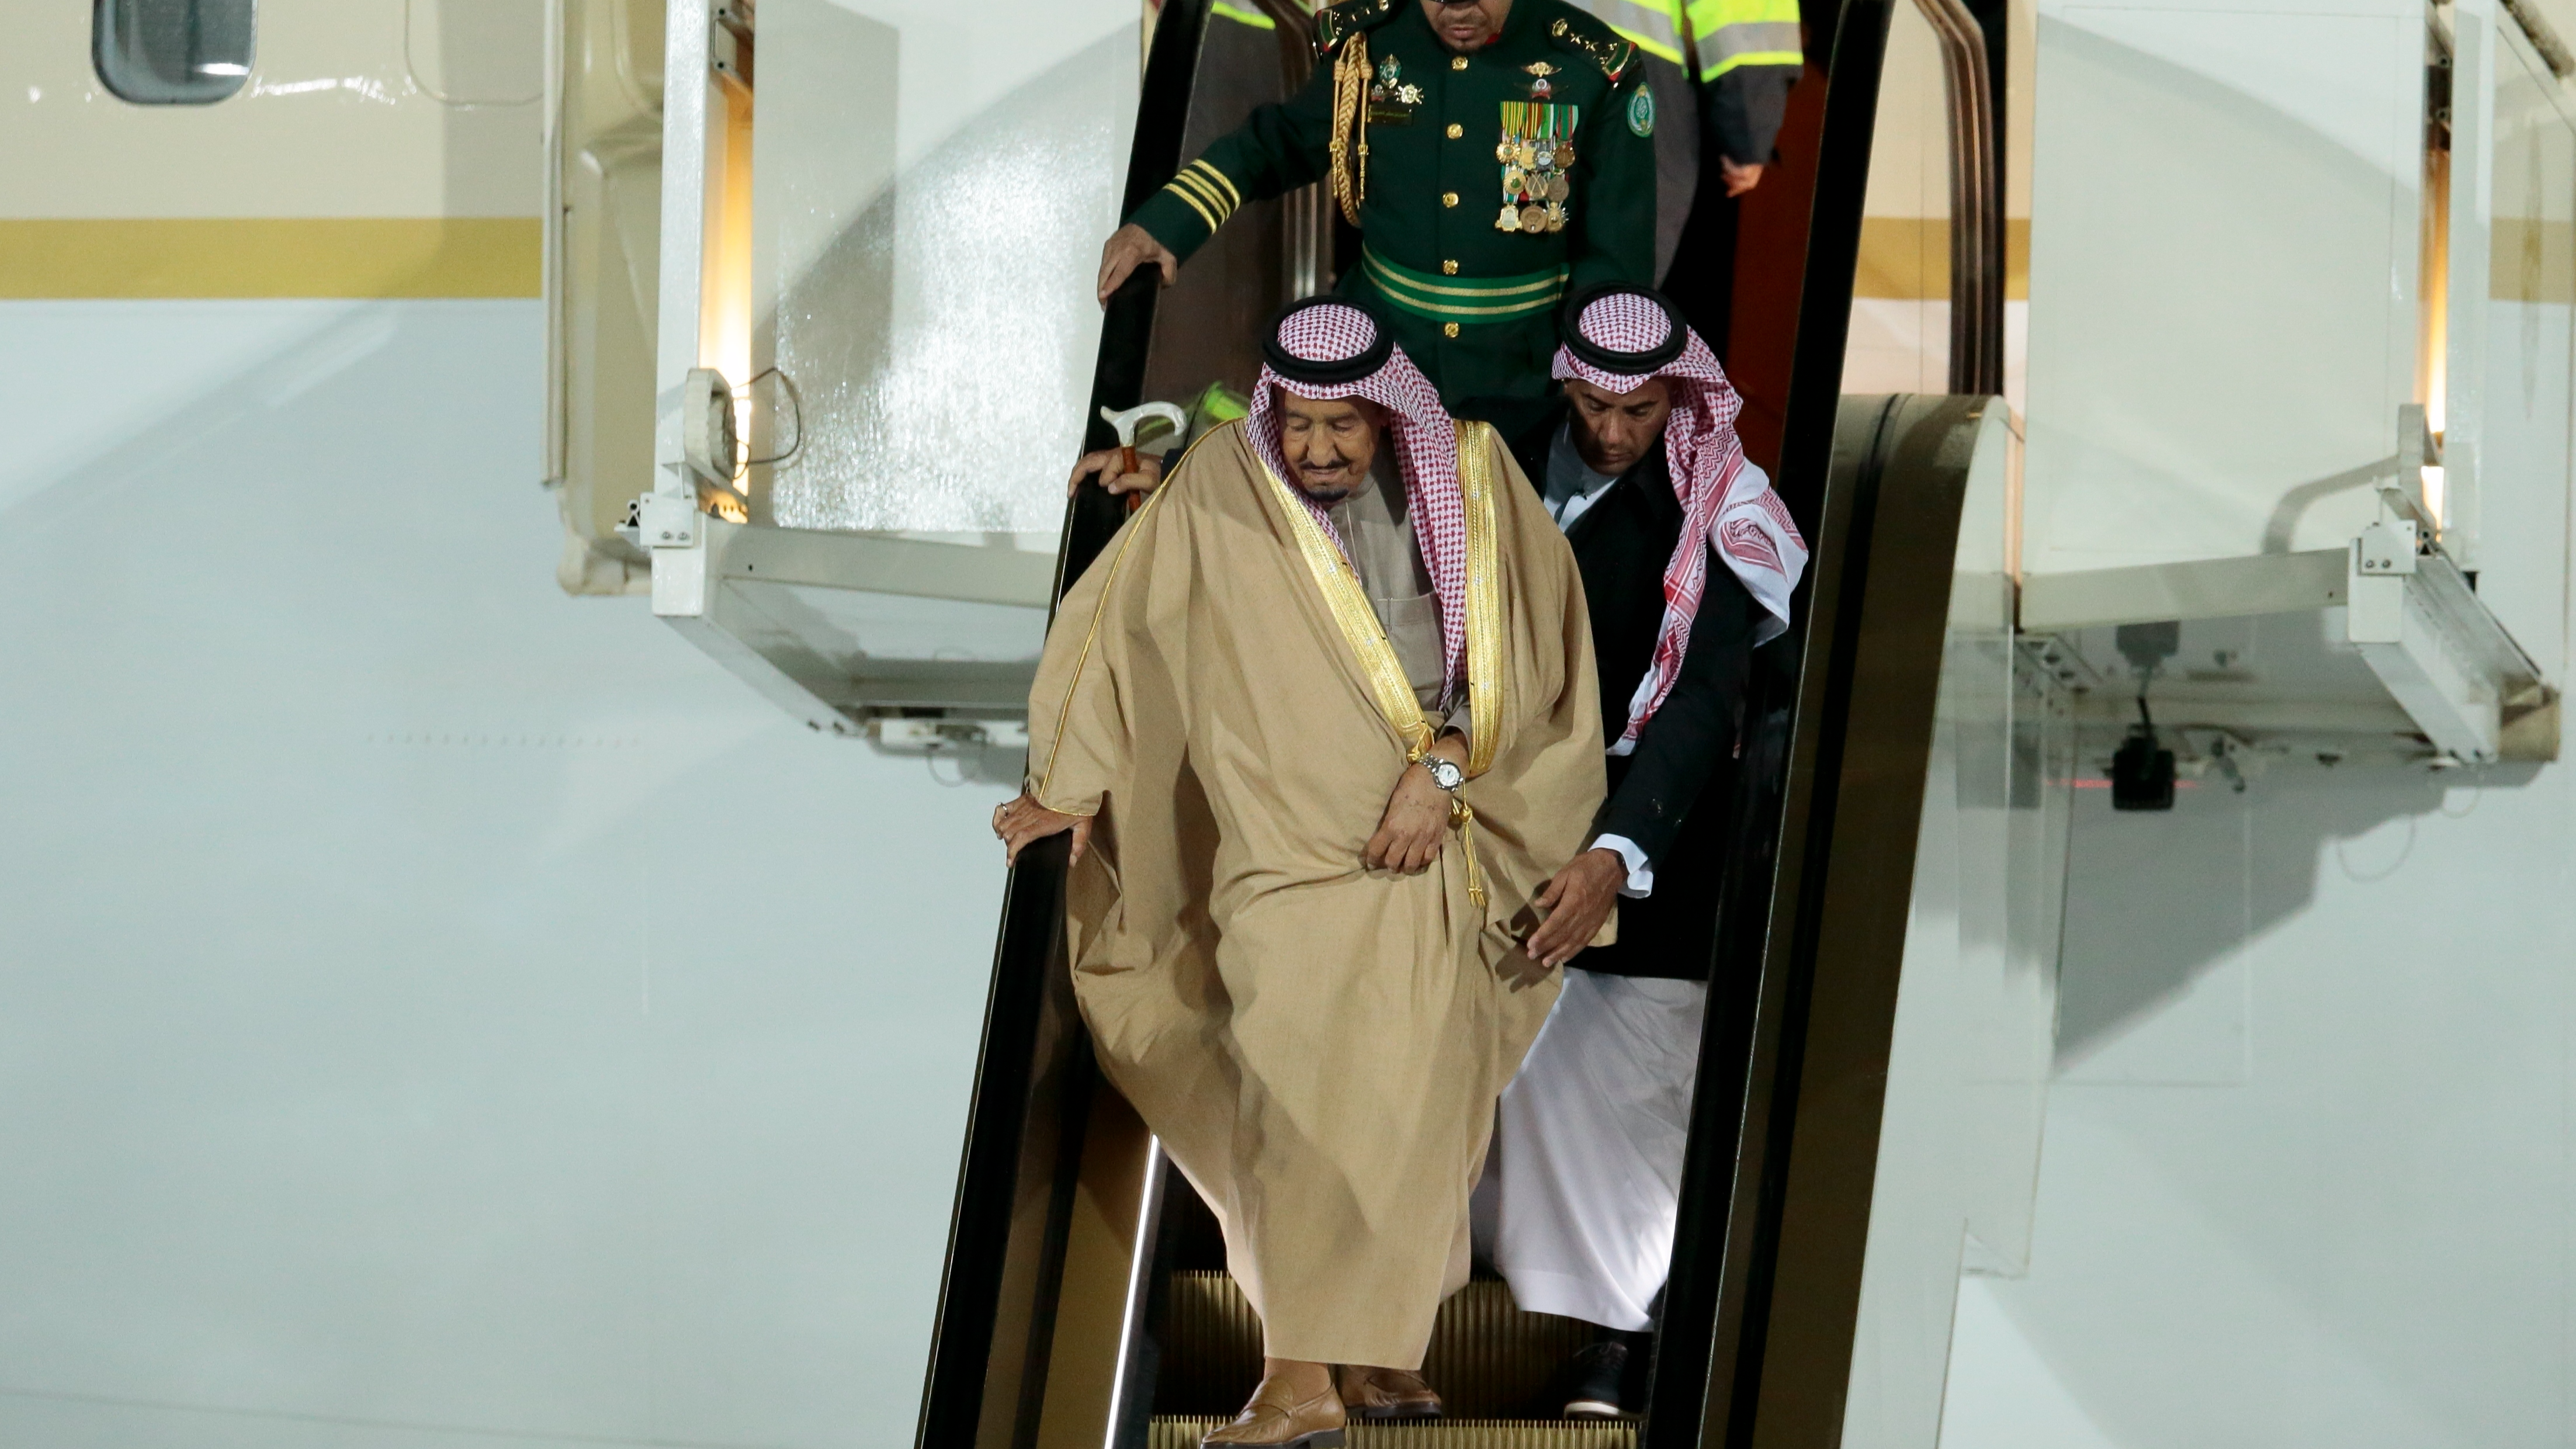 Saudi King Salman's Golden Escalator Awkwardly Breaks In Russia